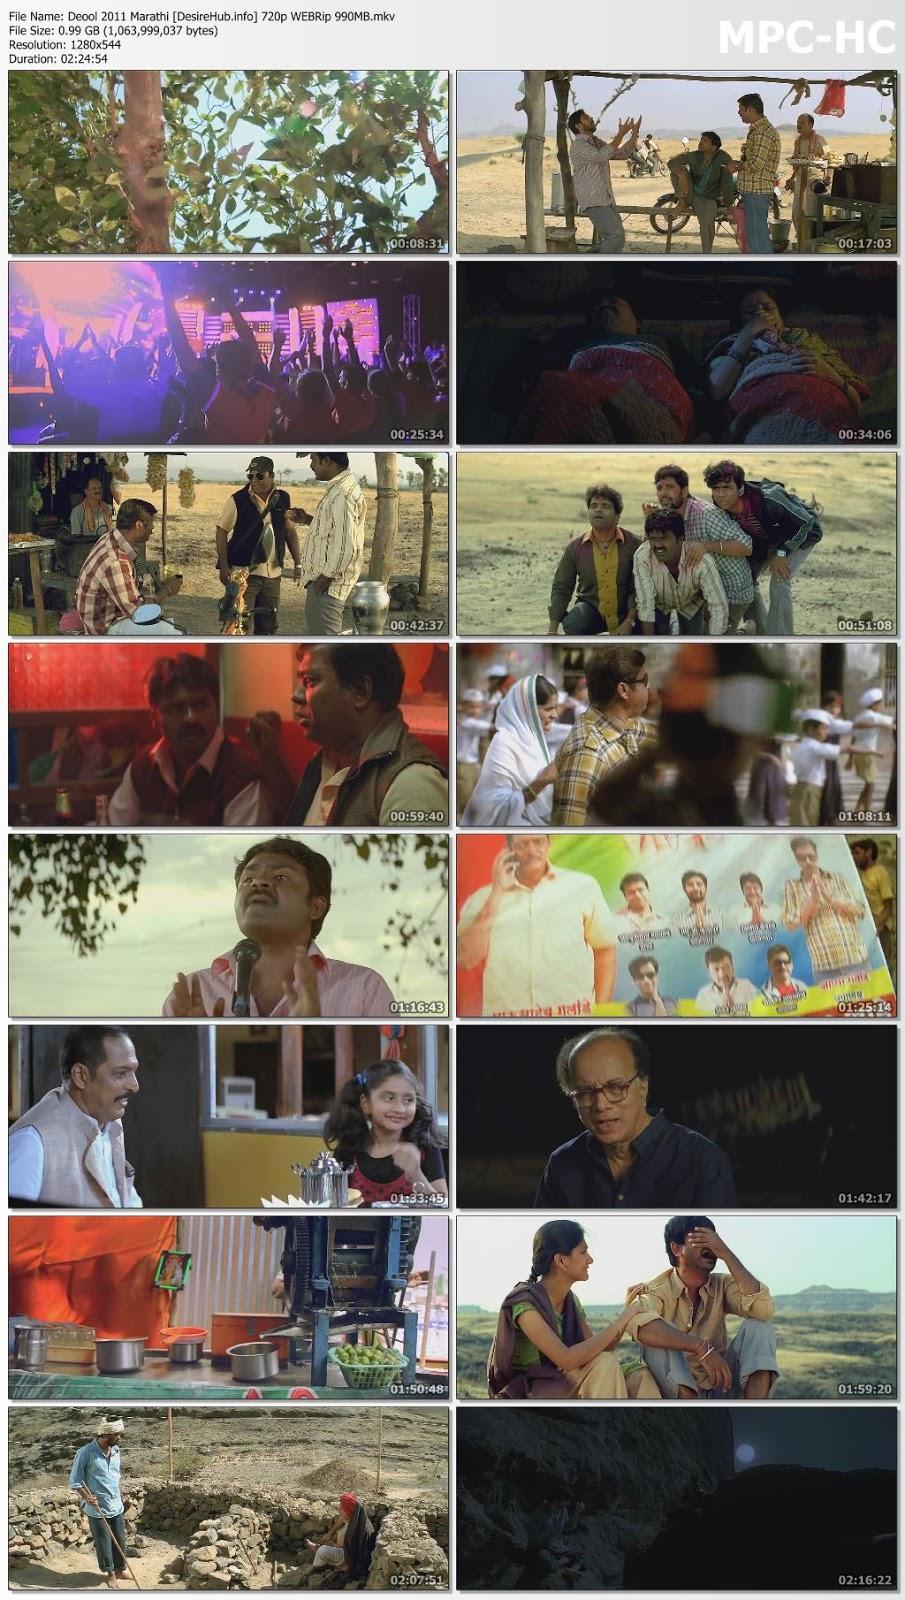 Deool 2011 Marathi 720p WEBRip 990MB Desirehub